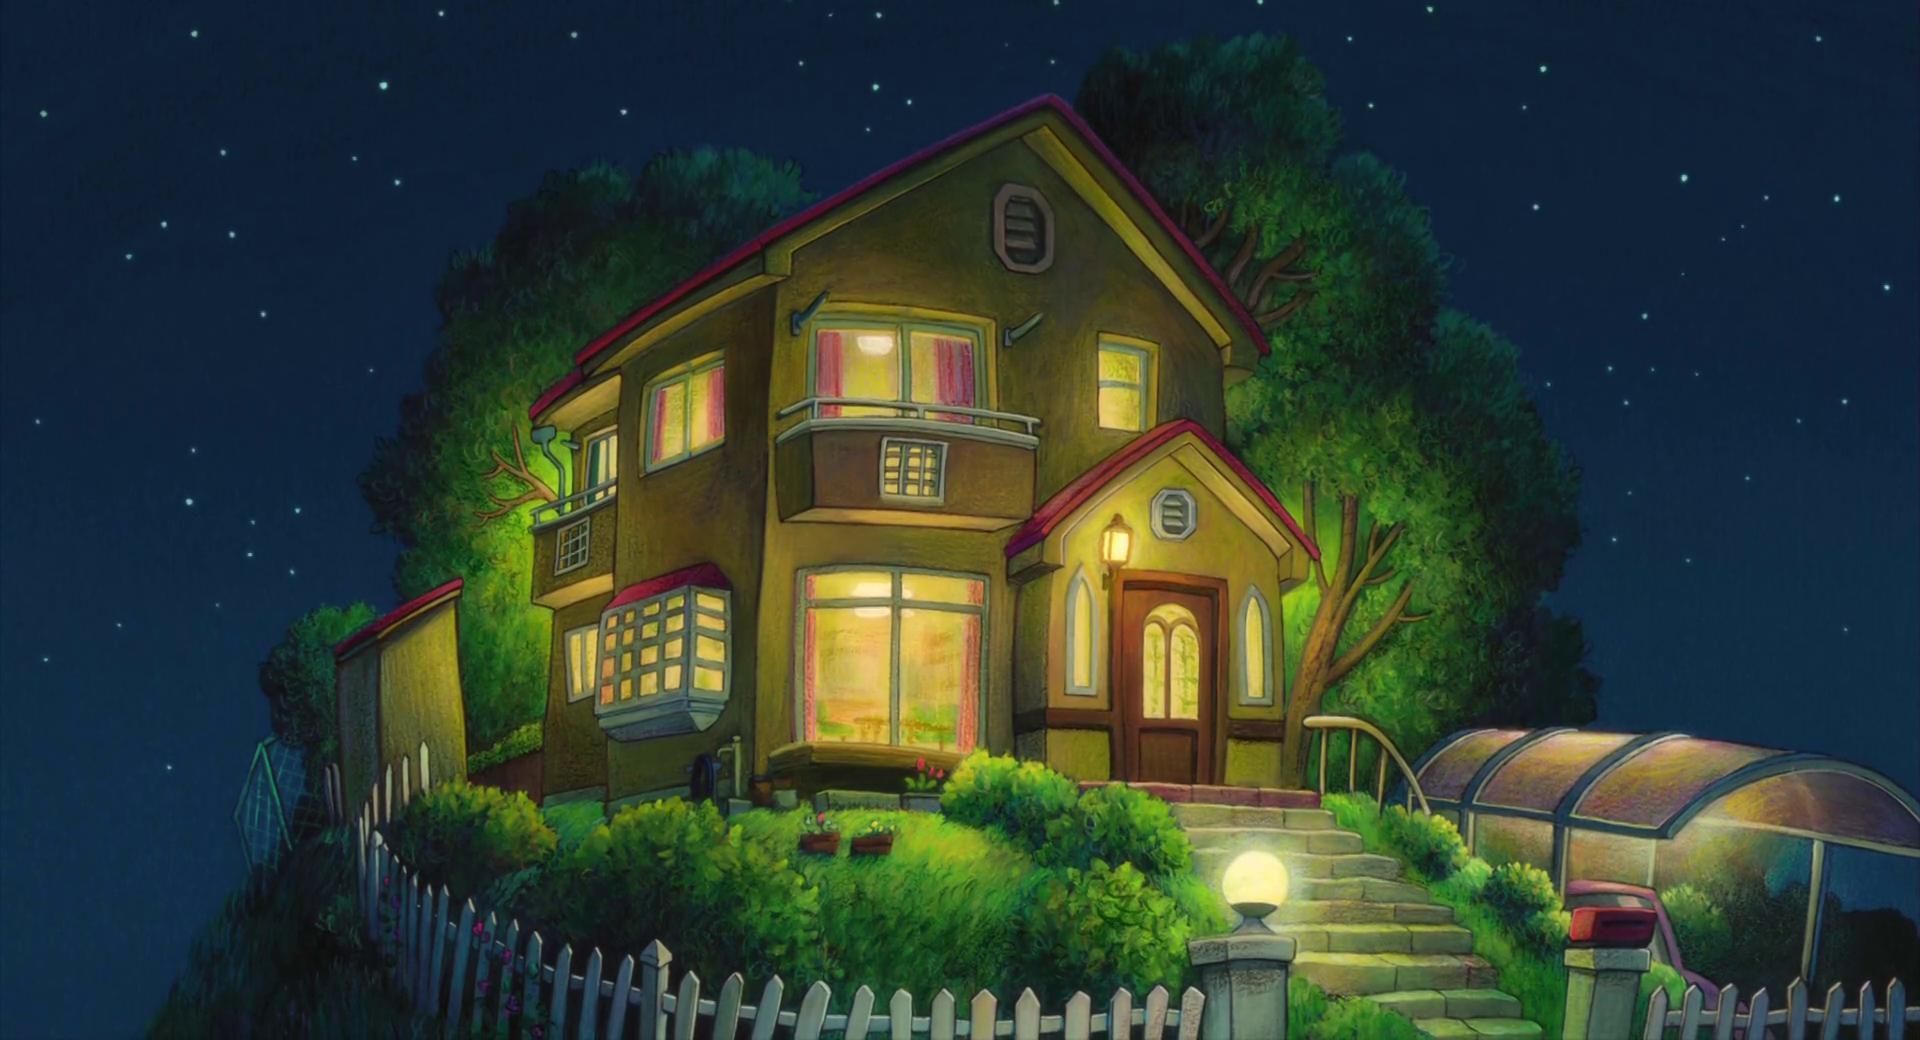 1920x1040 HD Desktop Studio Ghibli Background